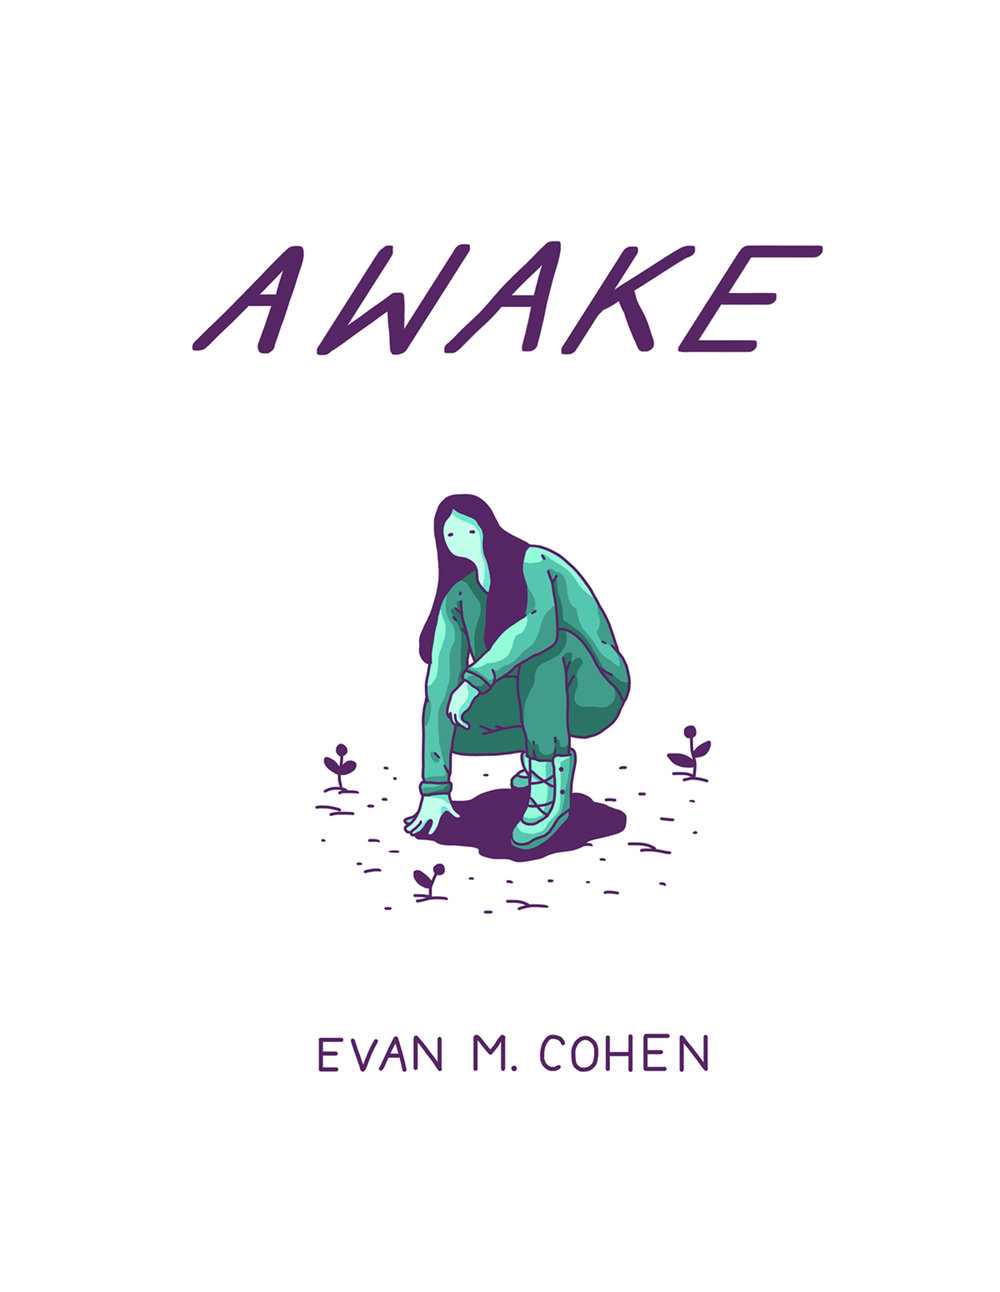 Awake, 2017